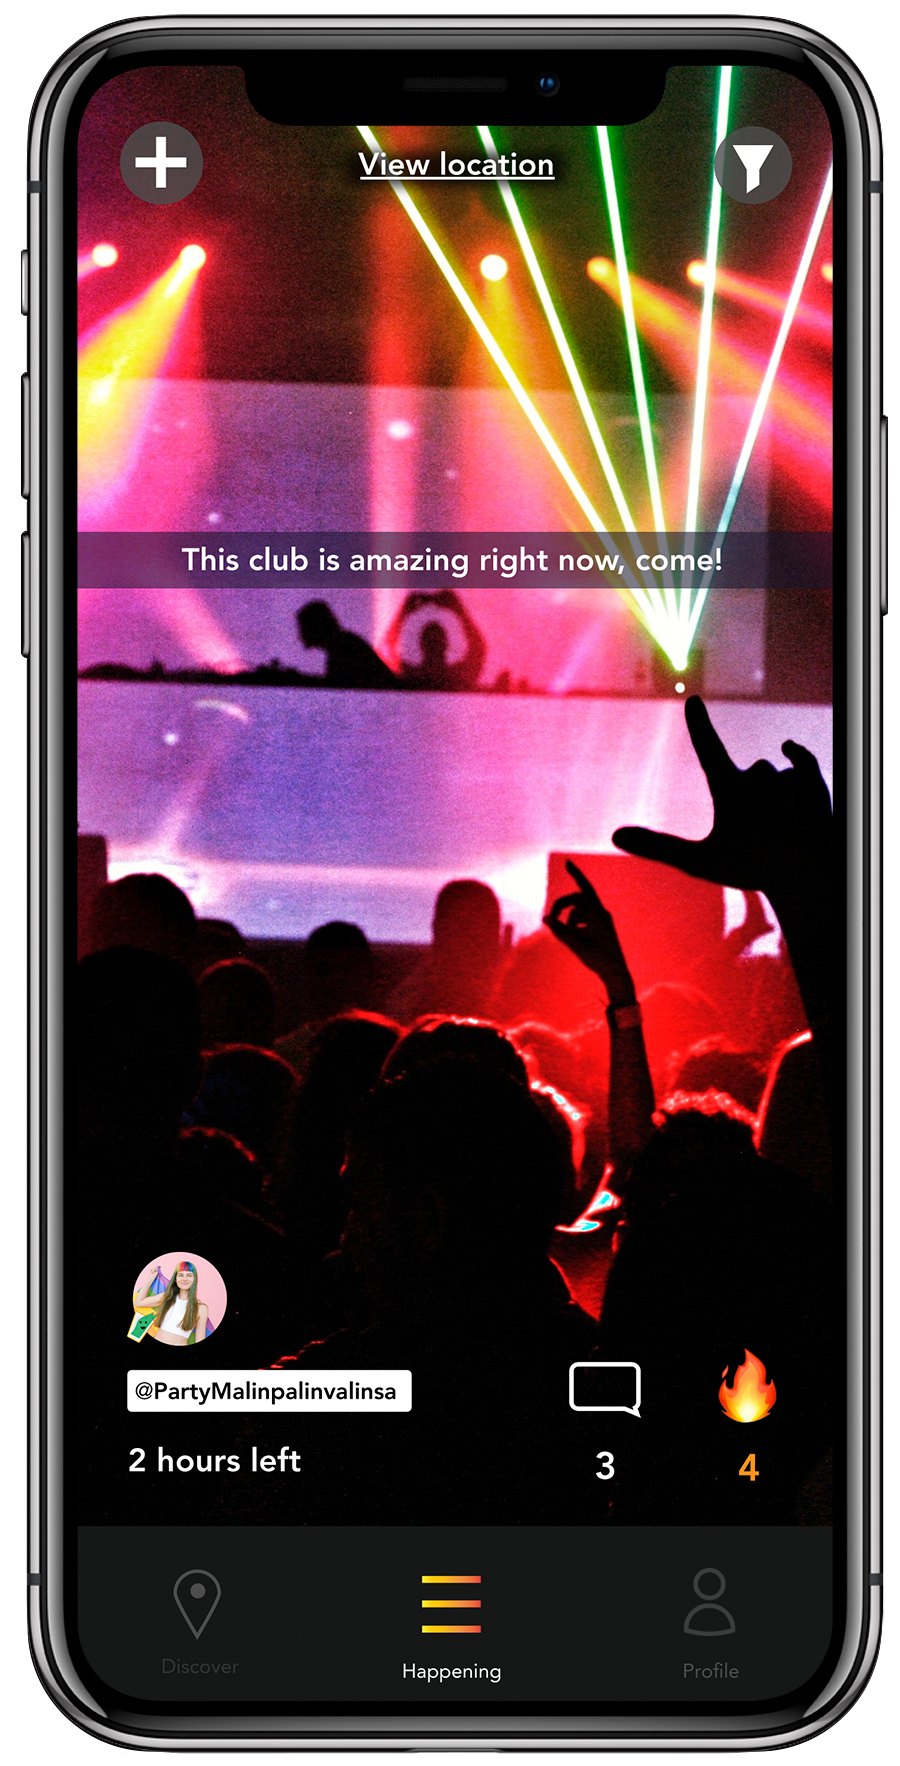 An event at a nightclub on the nightli app